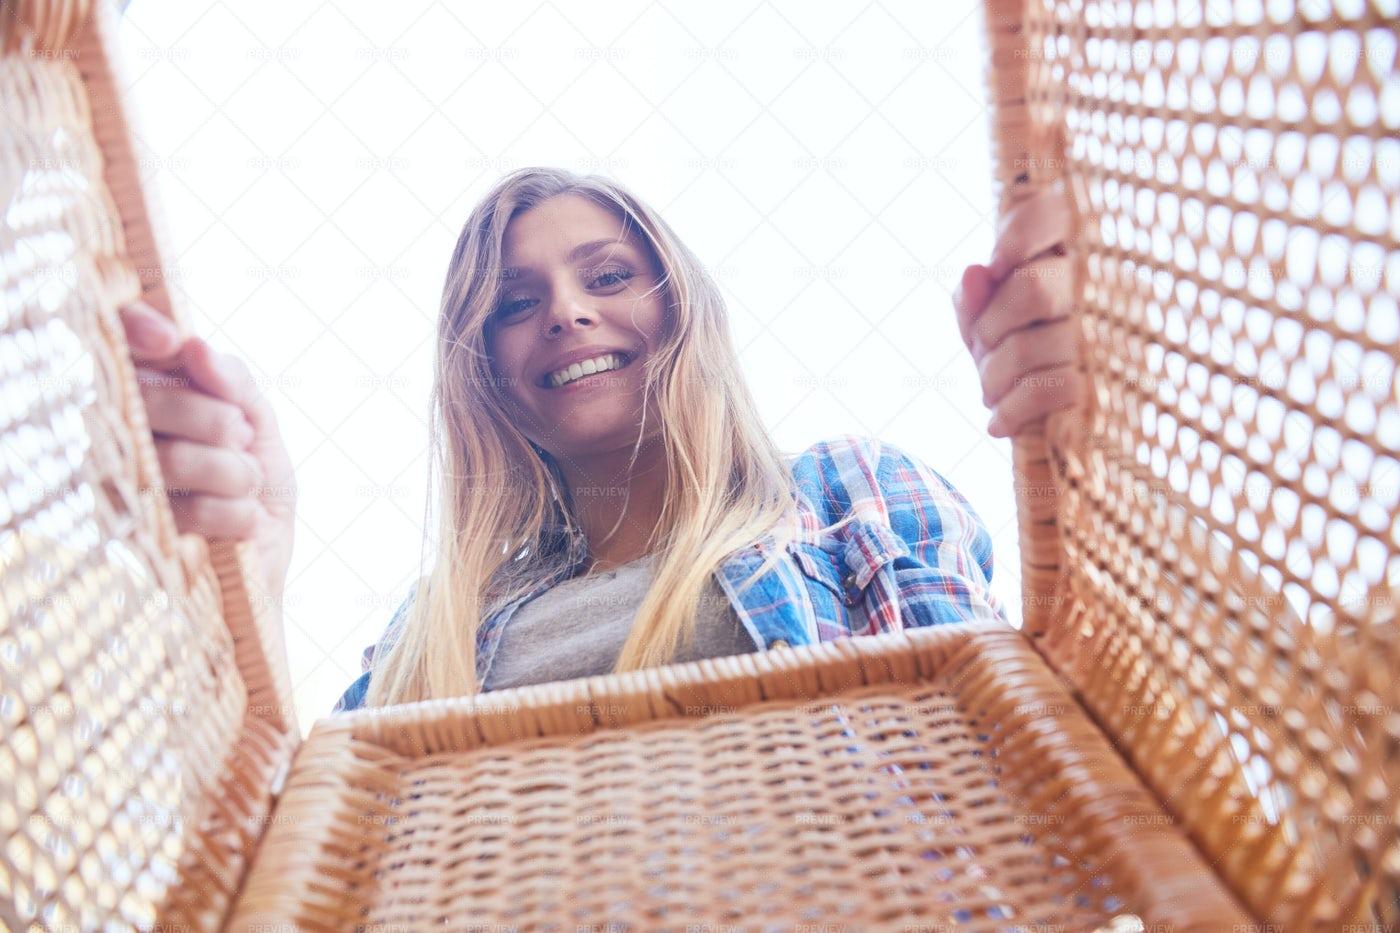 Young Woman Holding Basket: Stock Photos